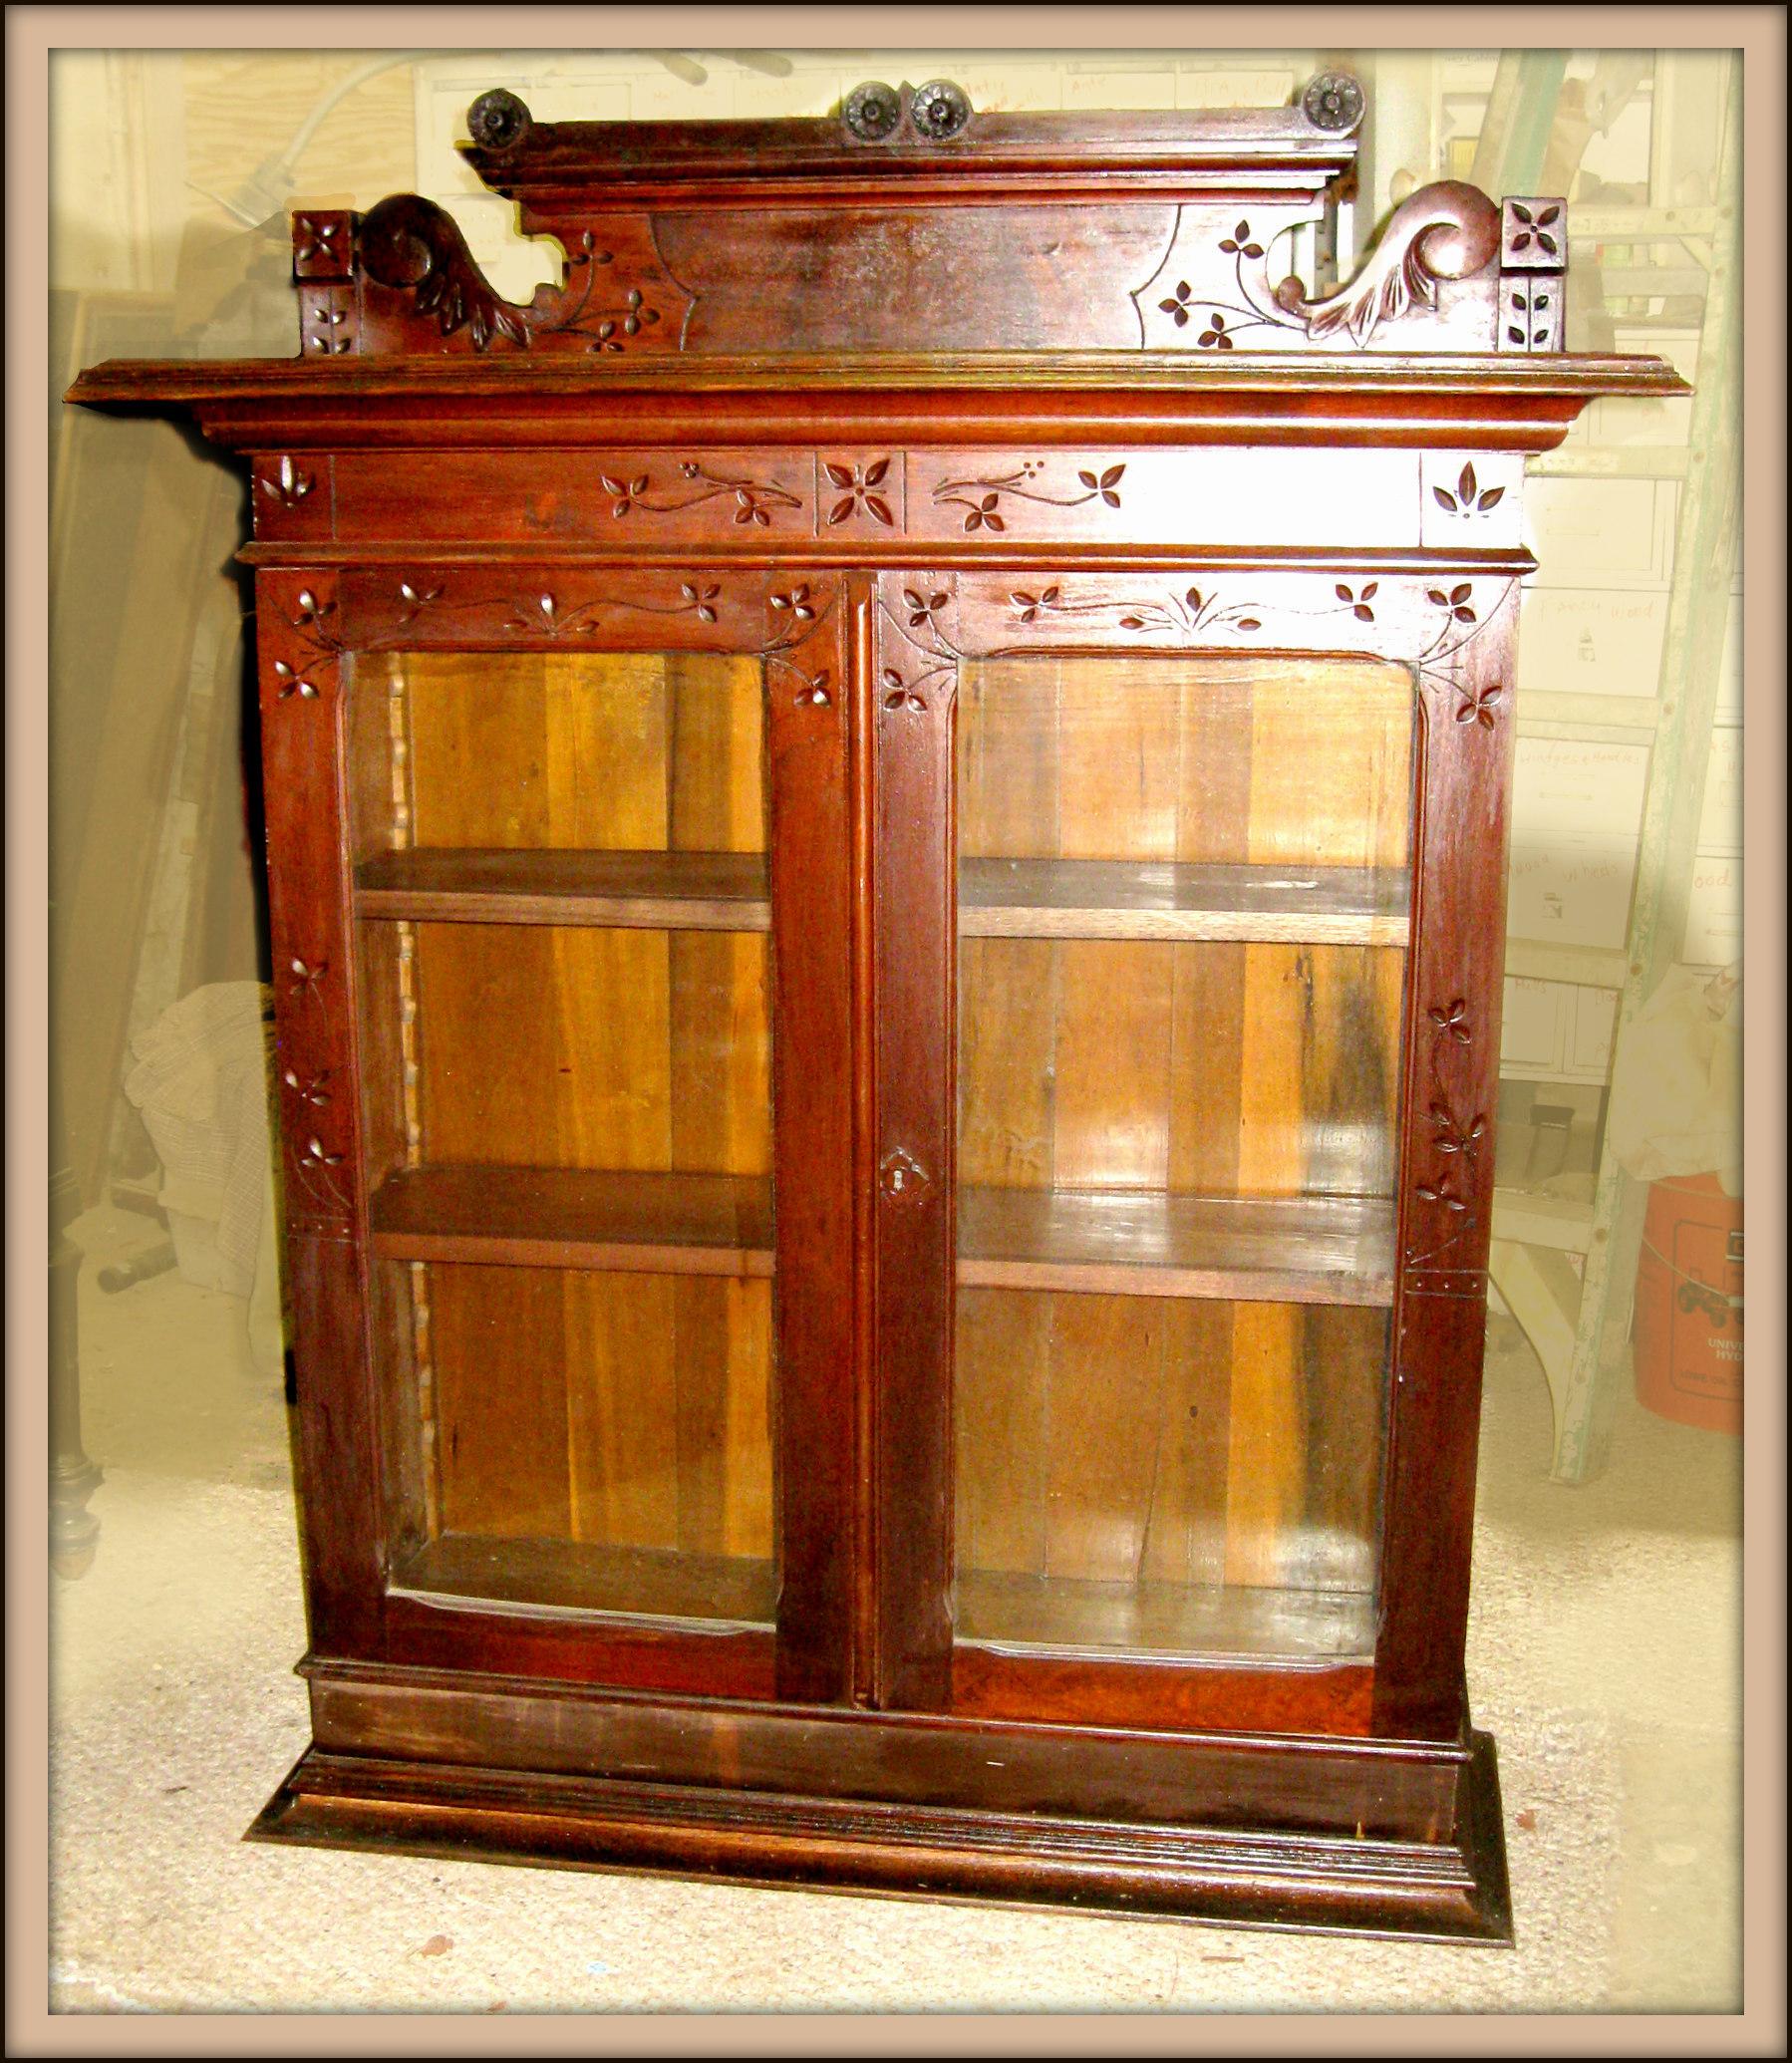 Mick Vevera 2015 Ornate Bookcase $225/sold